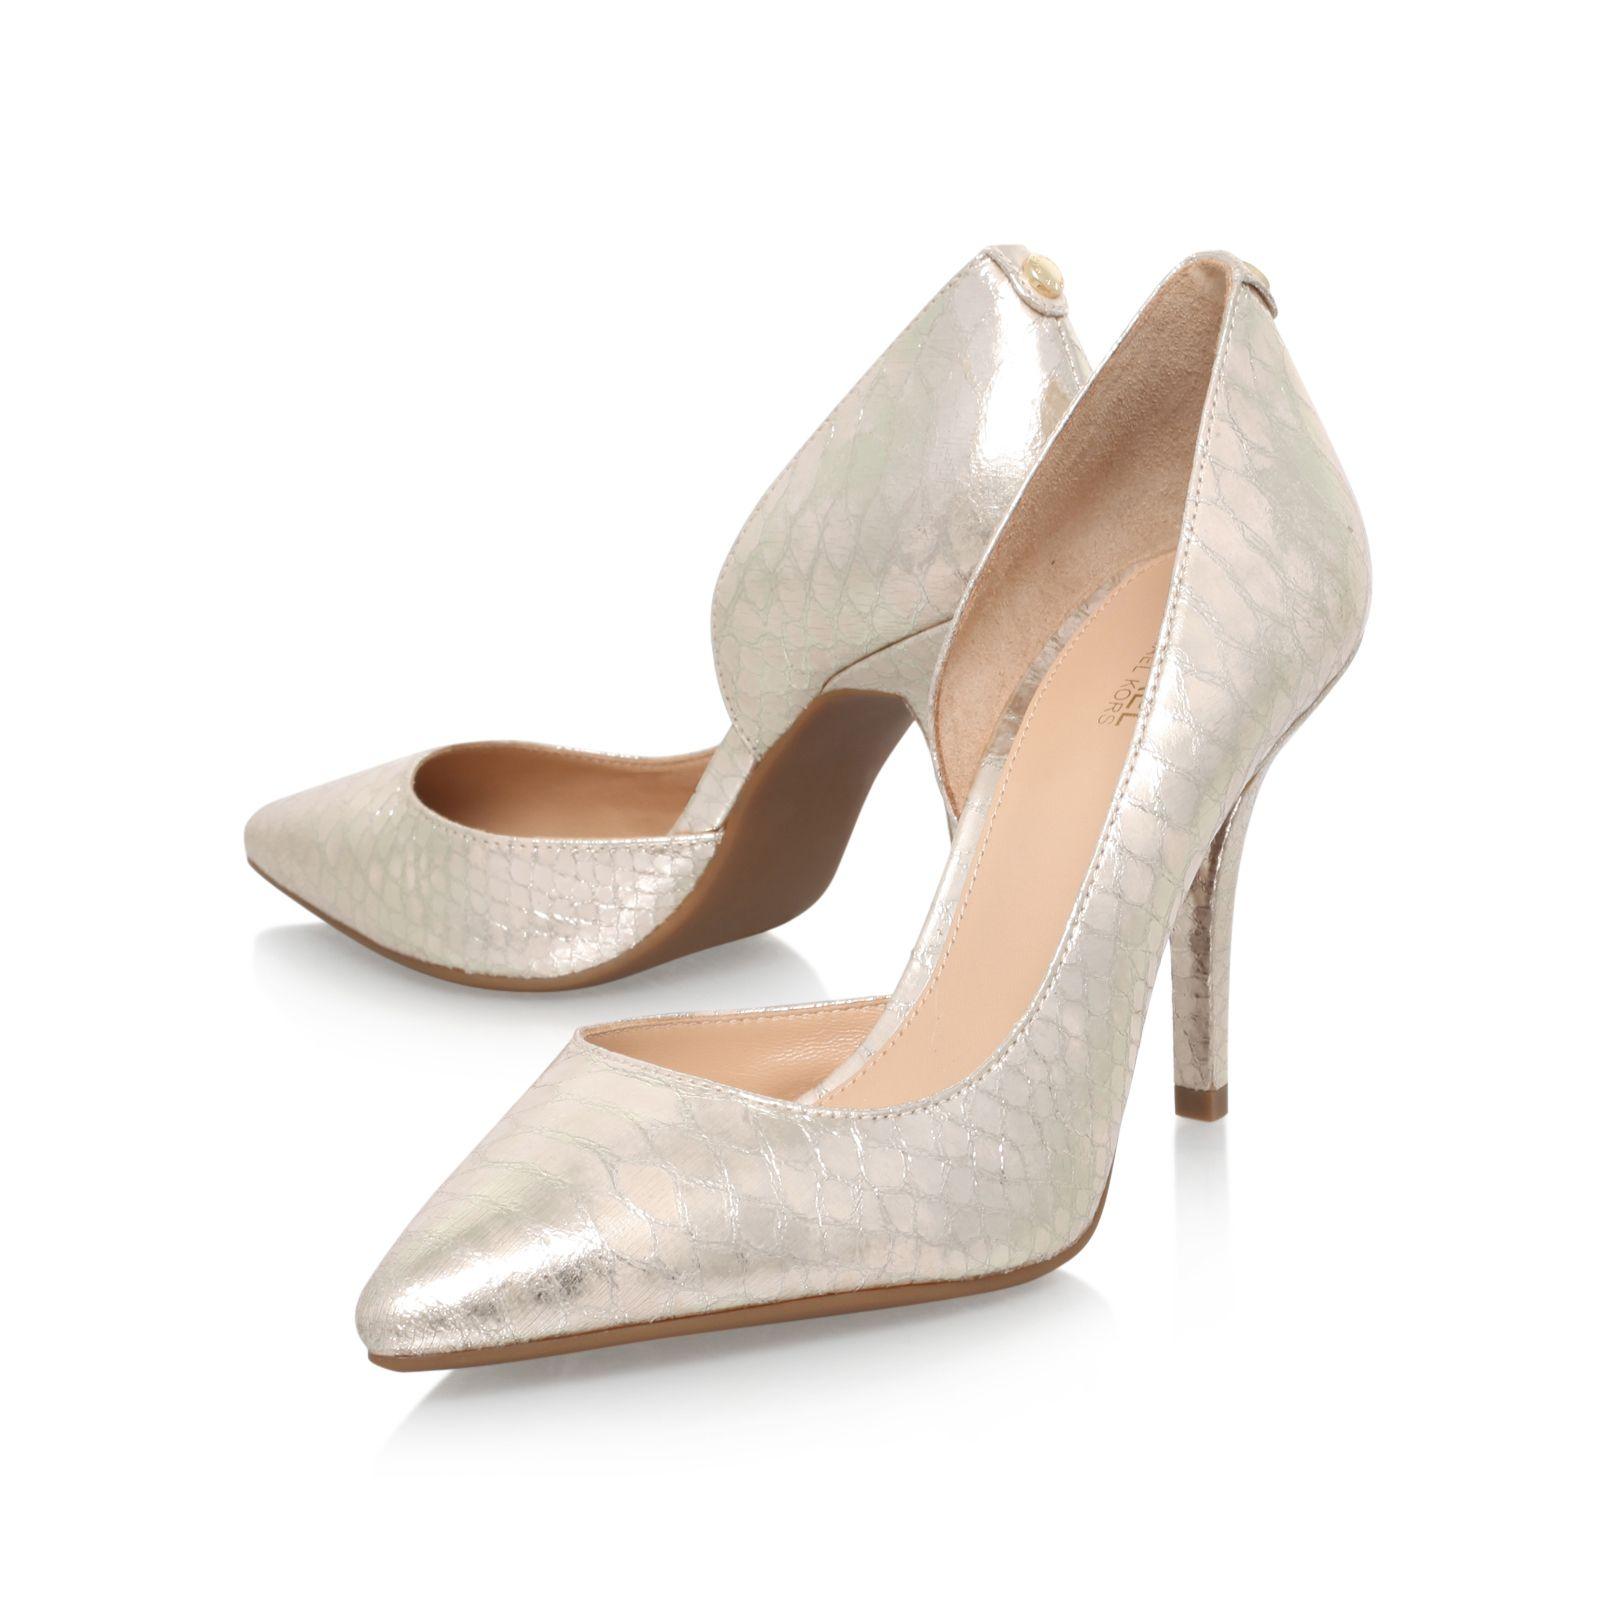 71917f77576f NATHALIE FLEX HIGH PUMP Michael Michael Kors Nathalie Flex High Pump Gold  Printed Leather High Heel Court Shoes by MICHAEL MICHAEL KORS